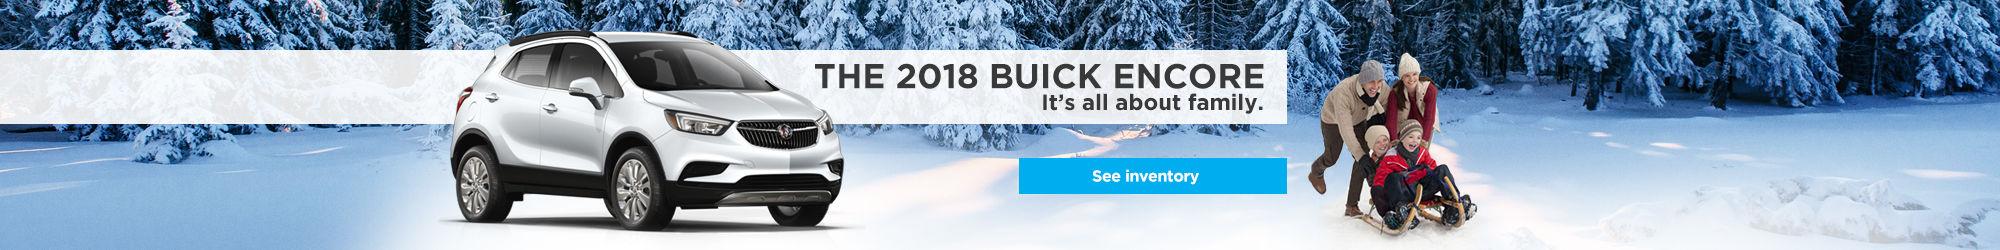 2018 Buick Encore (December)